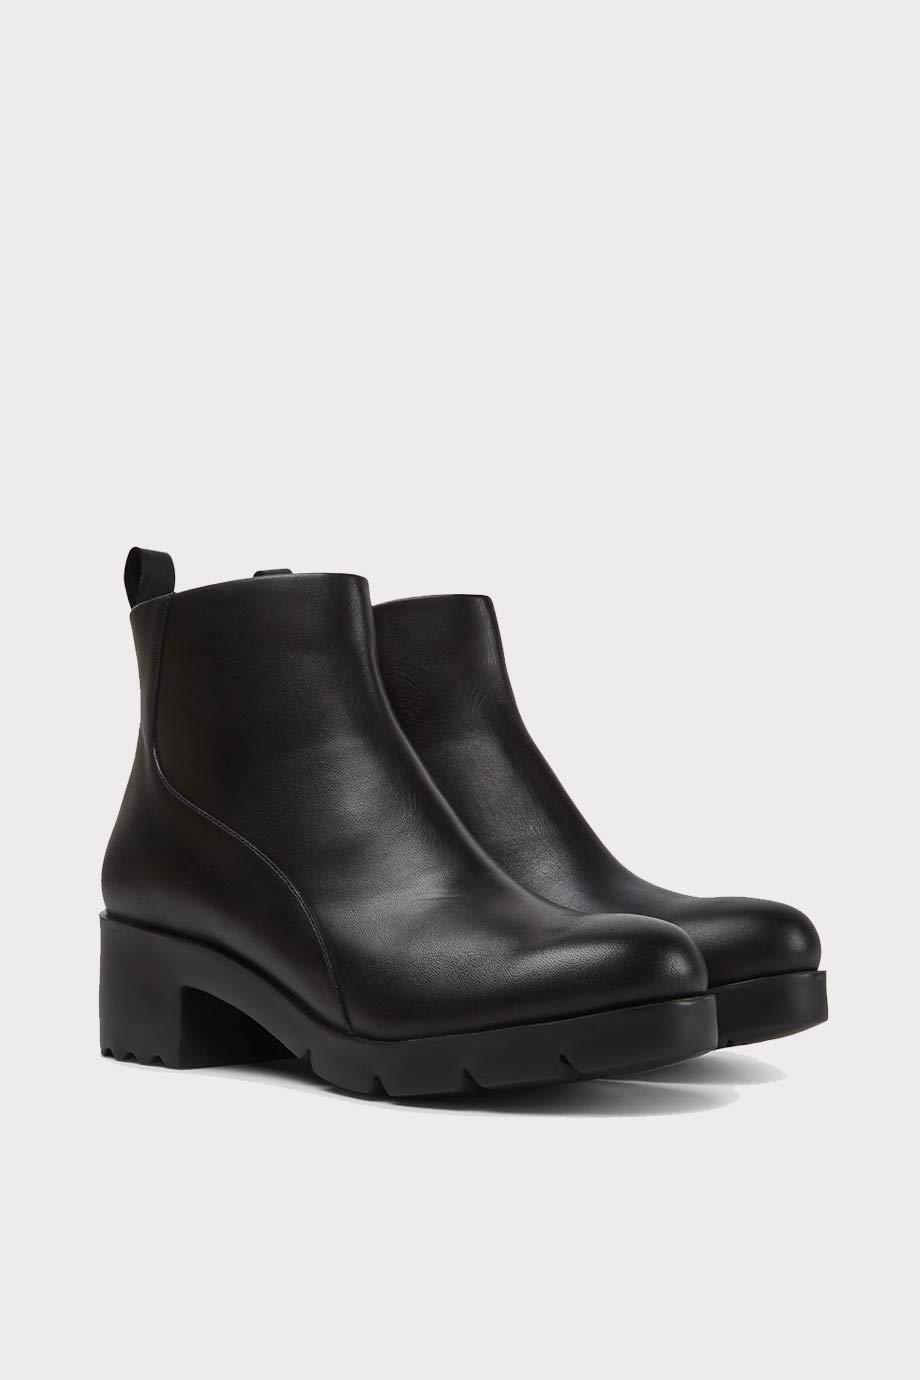 spiridoula metheniti shoes xalkida p K400228 004 camper 2